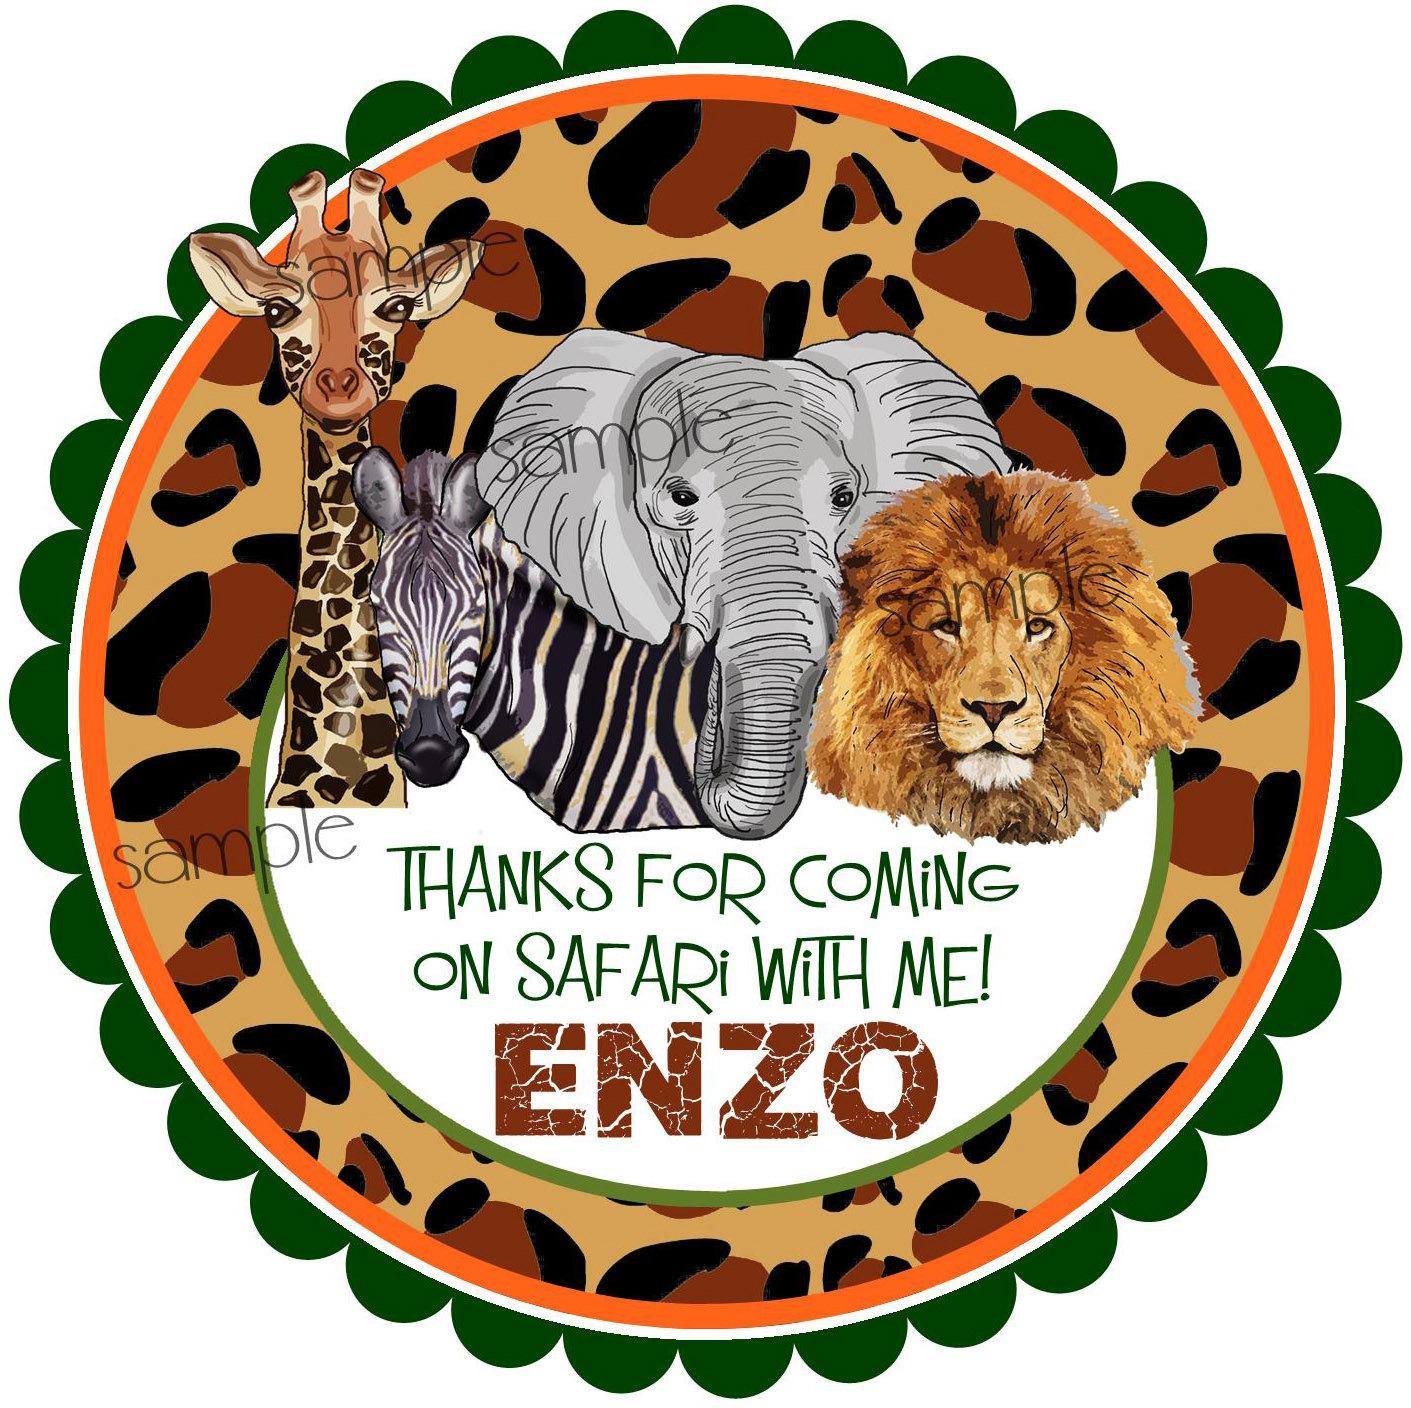 Leopard Print Party Decorations Safari Favor Tags Etsy